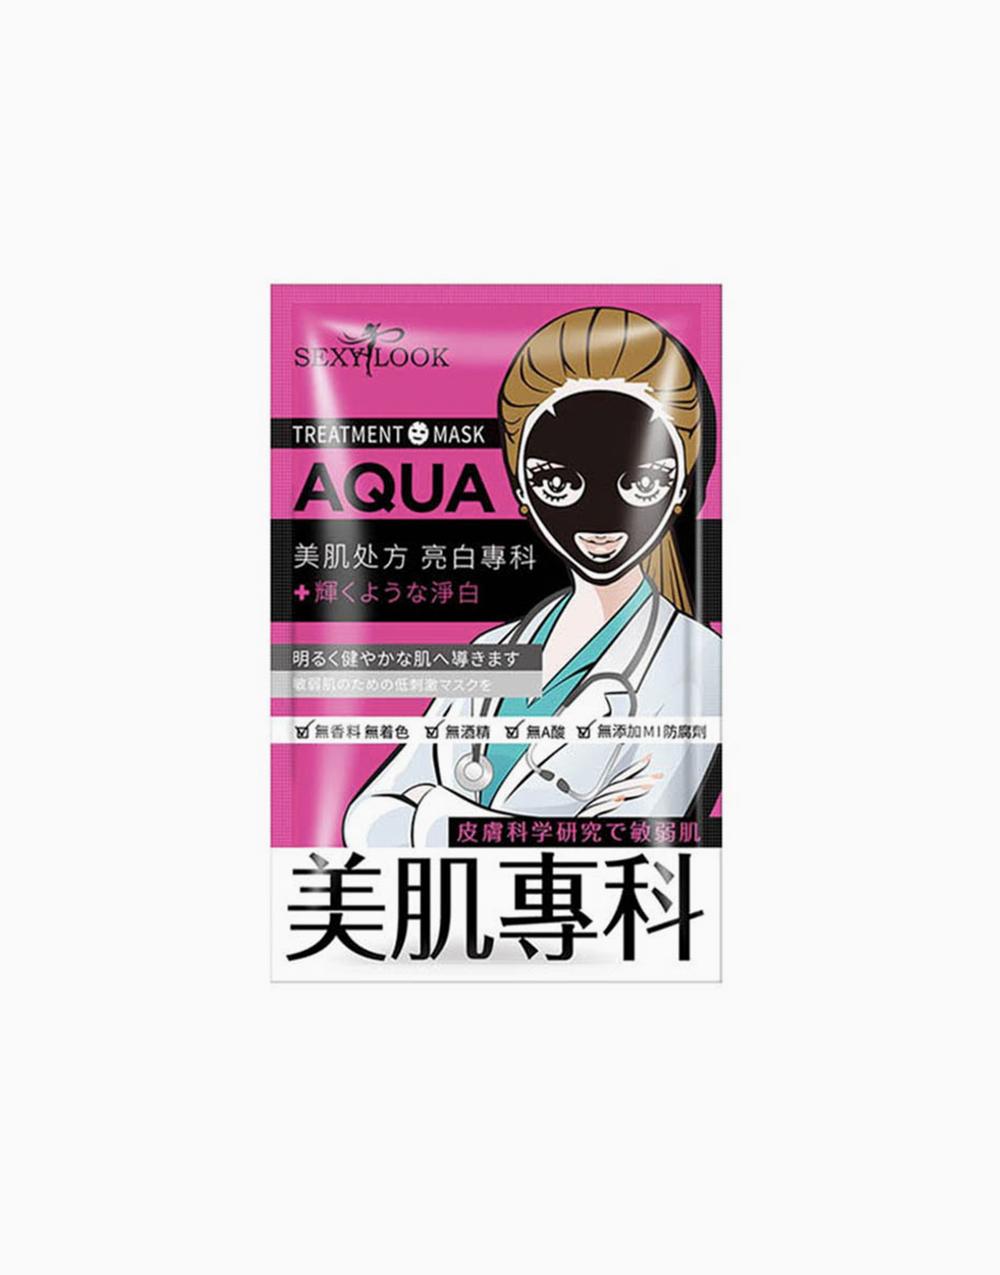 Medibeauty Brightening Black Mask by SEXYLOOK